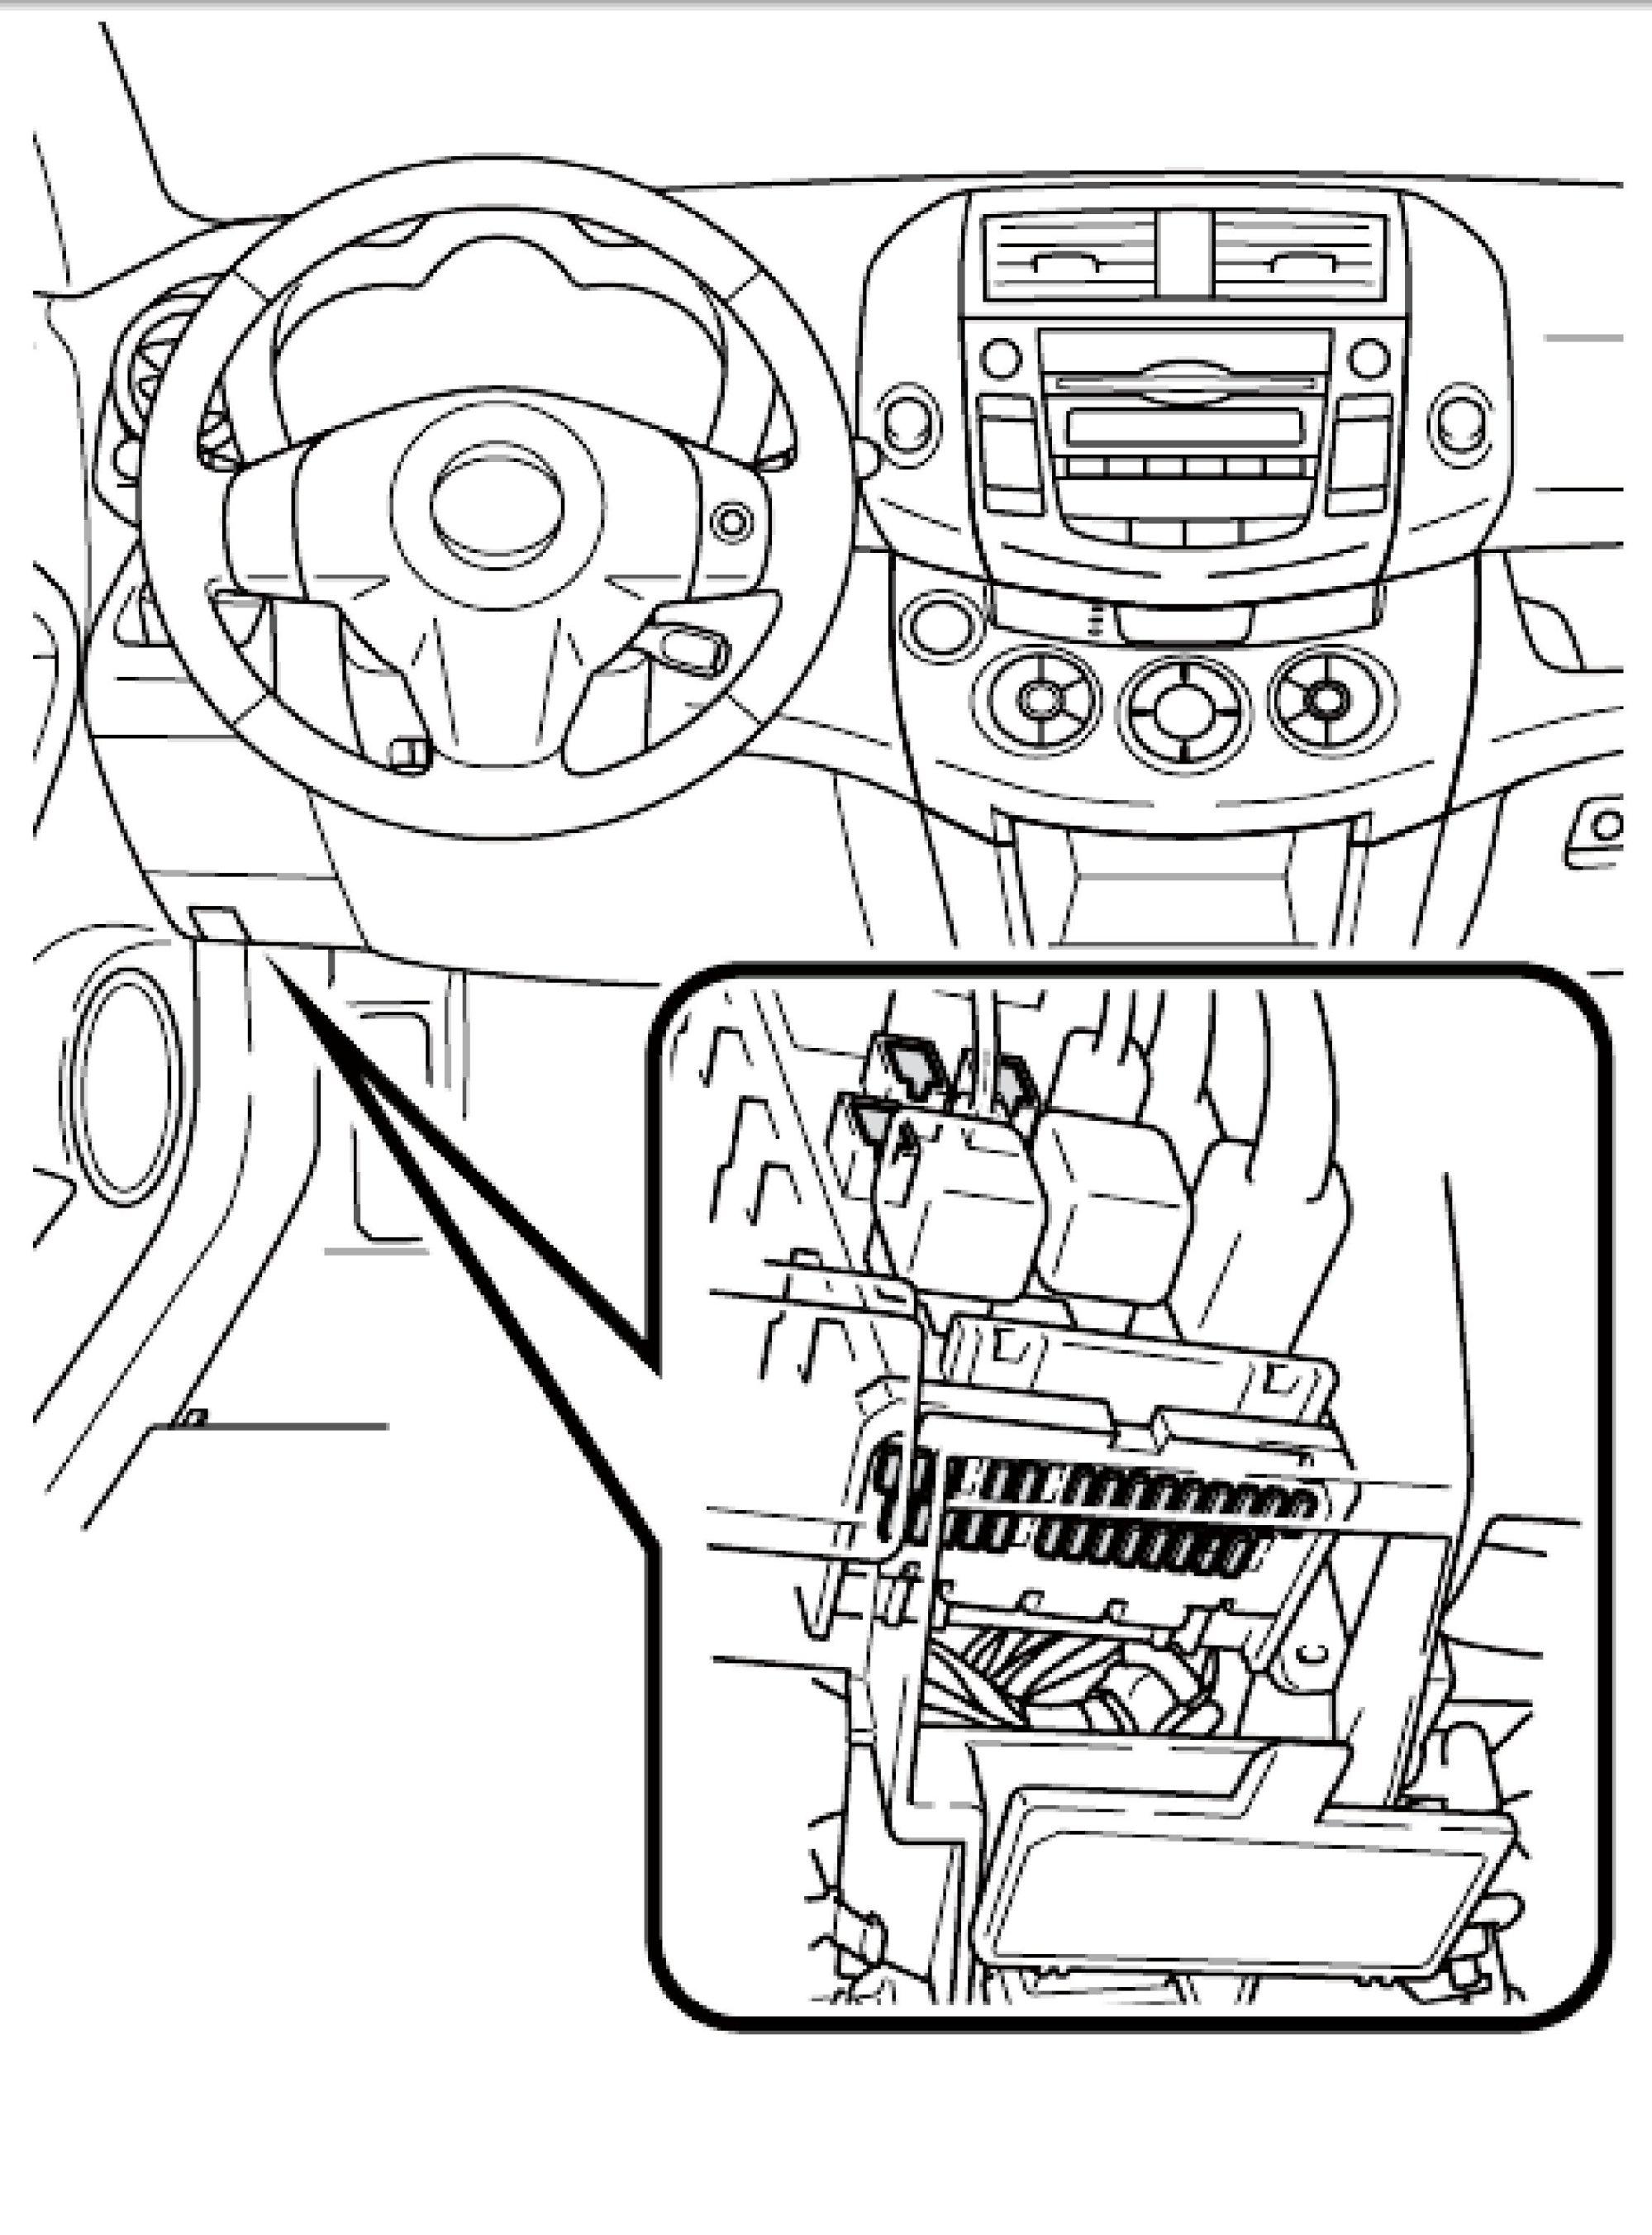 hight resolution of 98 mercury tracer fuse diagram online wiring diagram1998 mercury sable fuse box diagram wiring diagram database1996